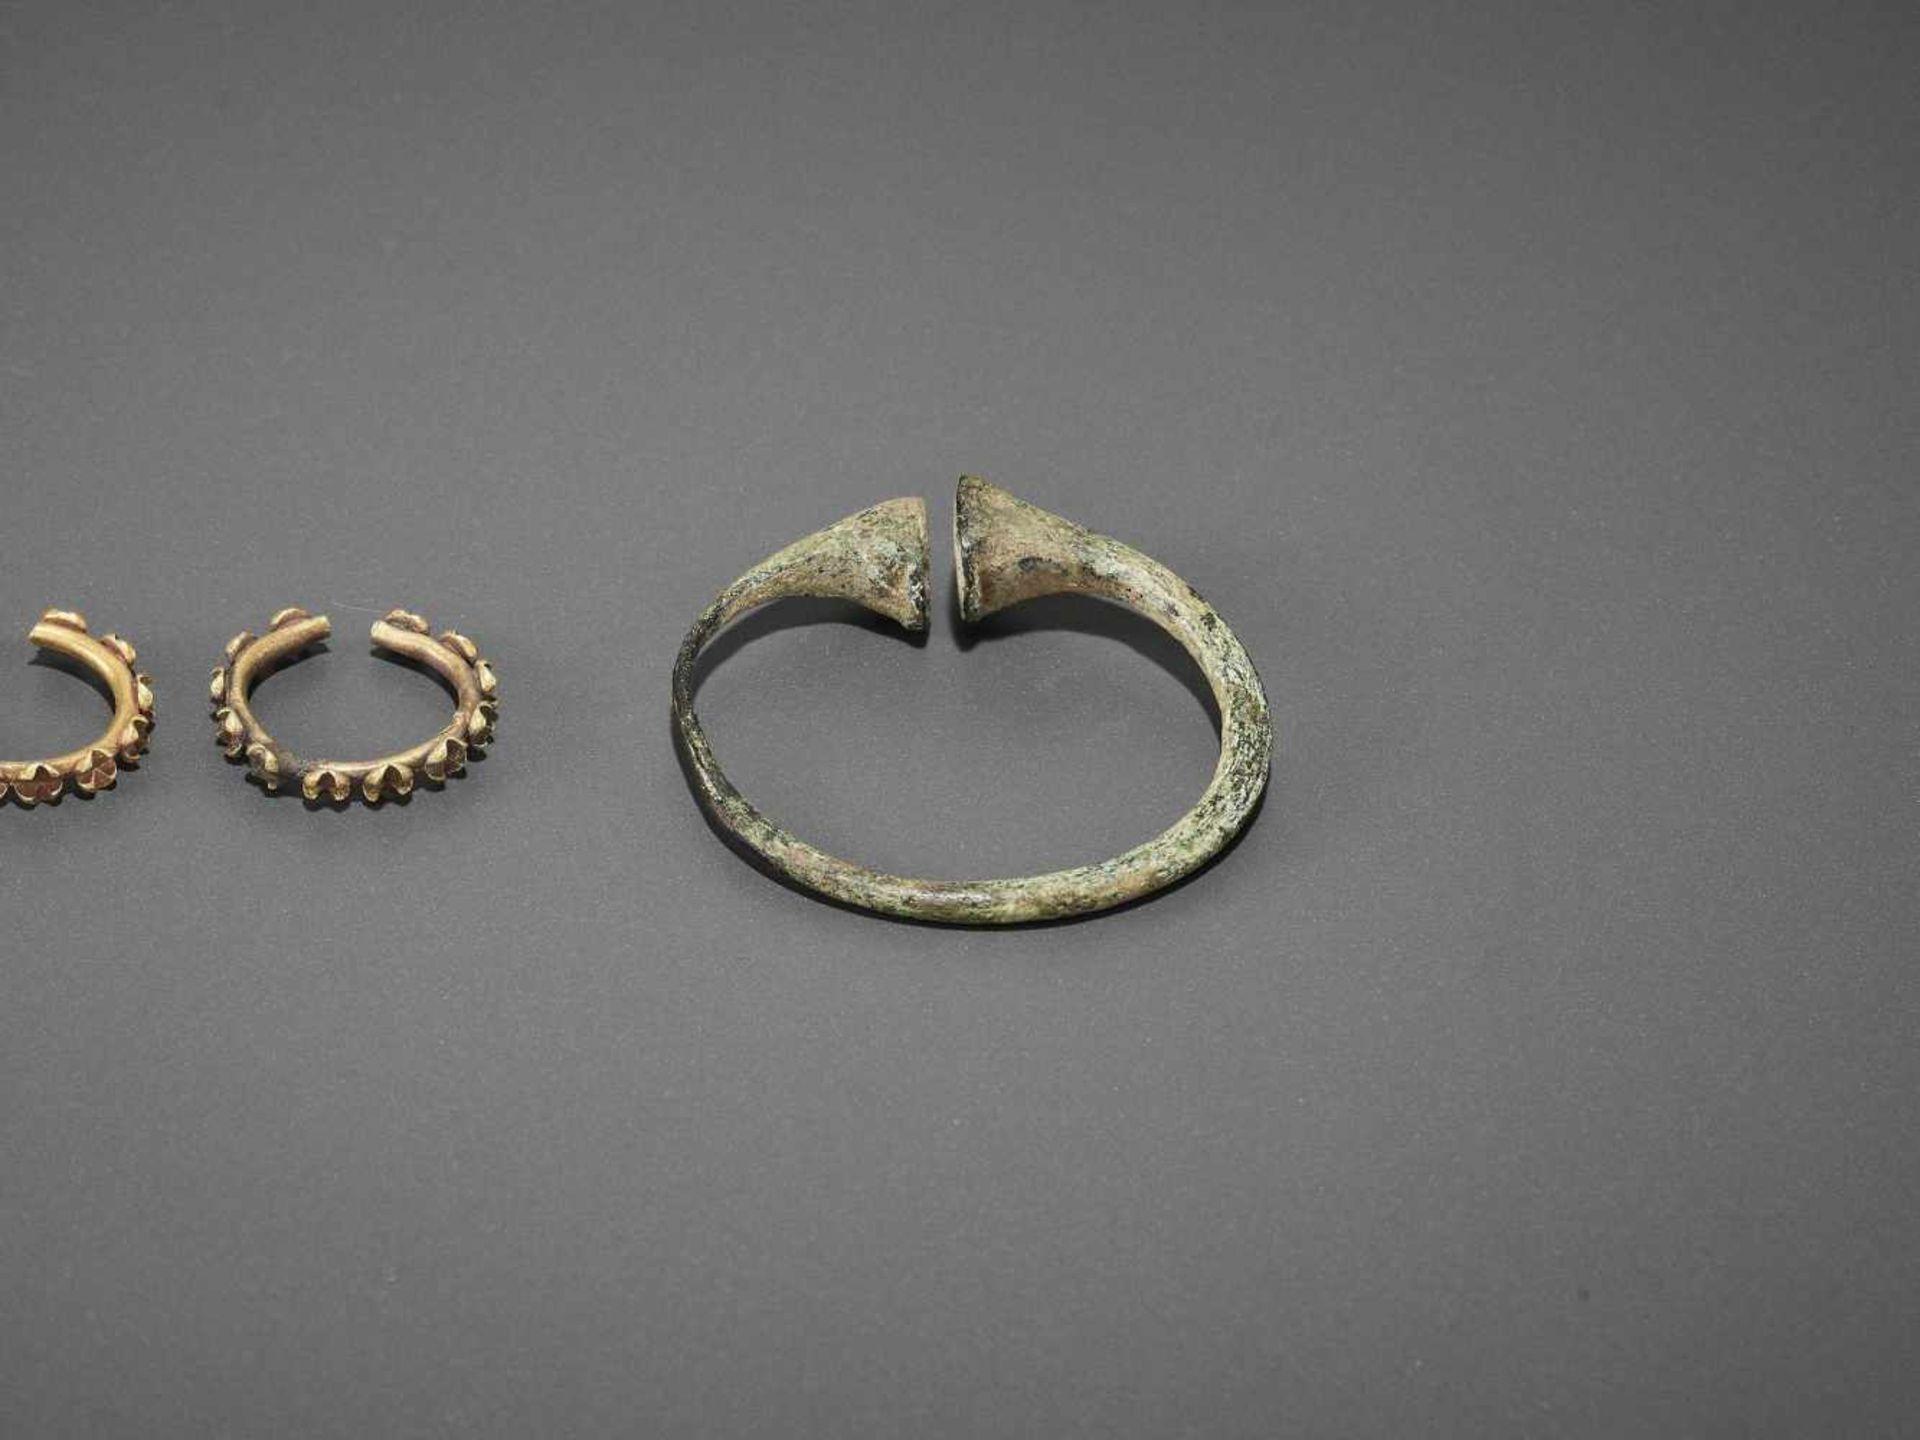 FIVE BACTRIAN GOLD AND BRONZE EARRINGS - Bild 4 aus 6